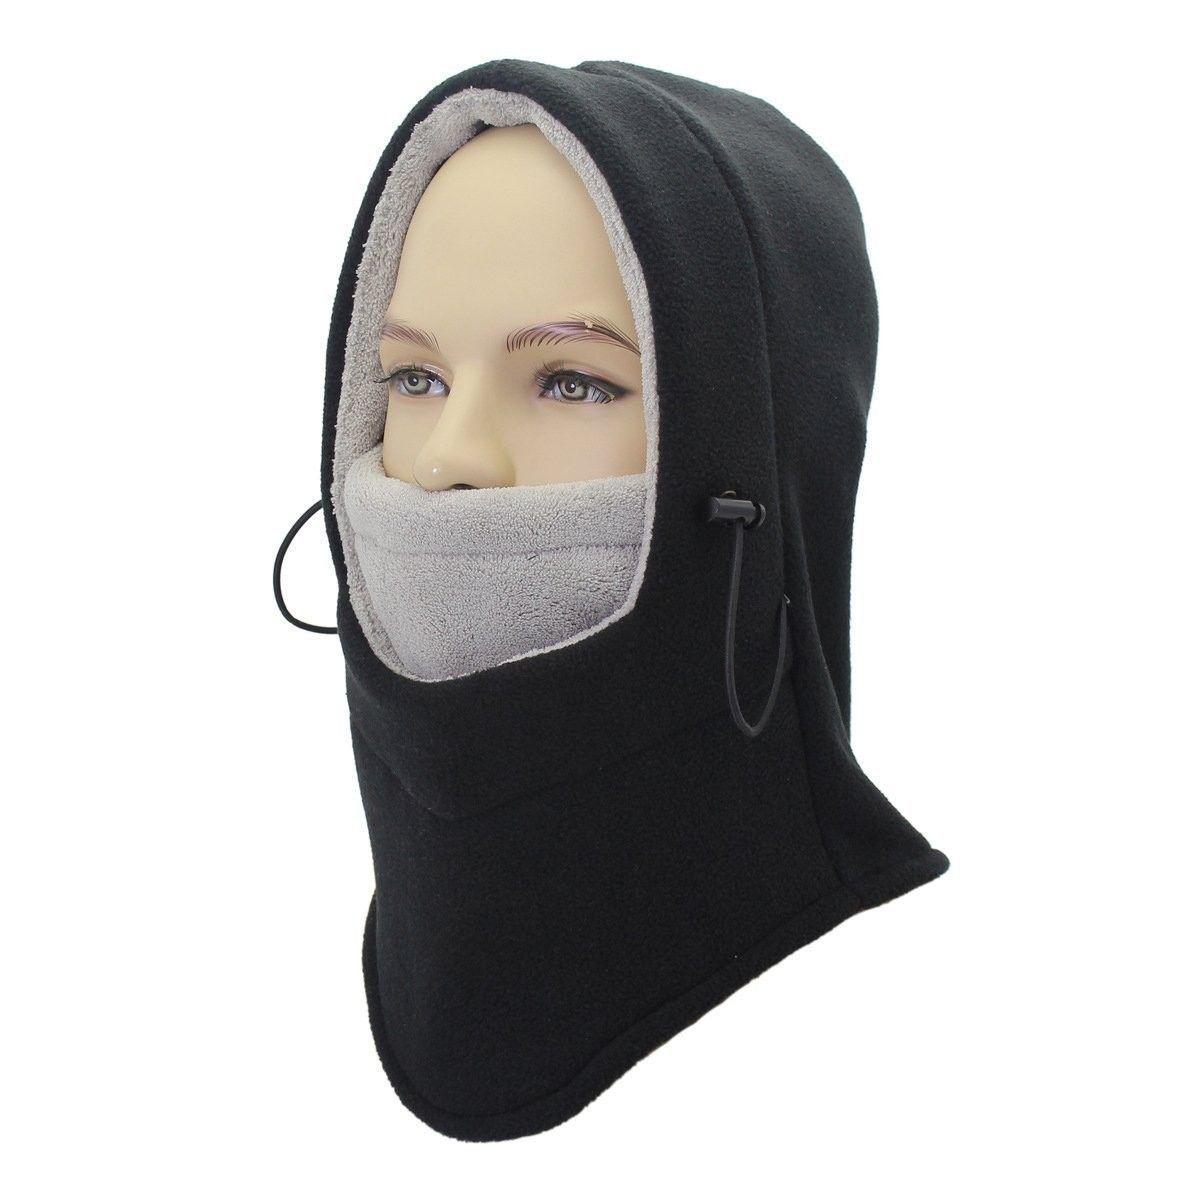 35 Use Balaclava Face Mask for Women To Winter Style | Neck warmer, Ski  mask, Hats